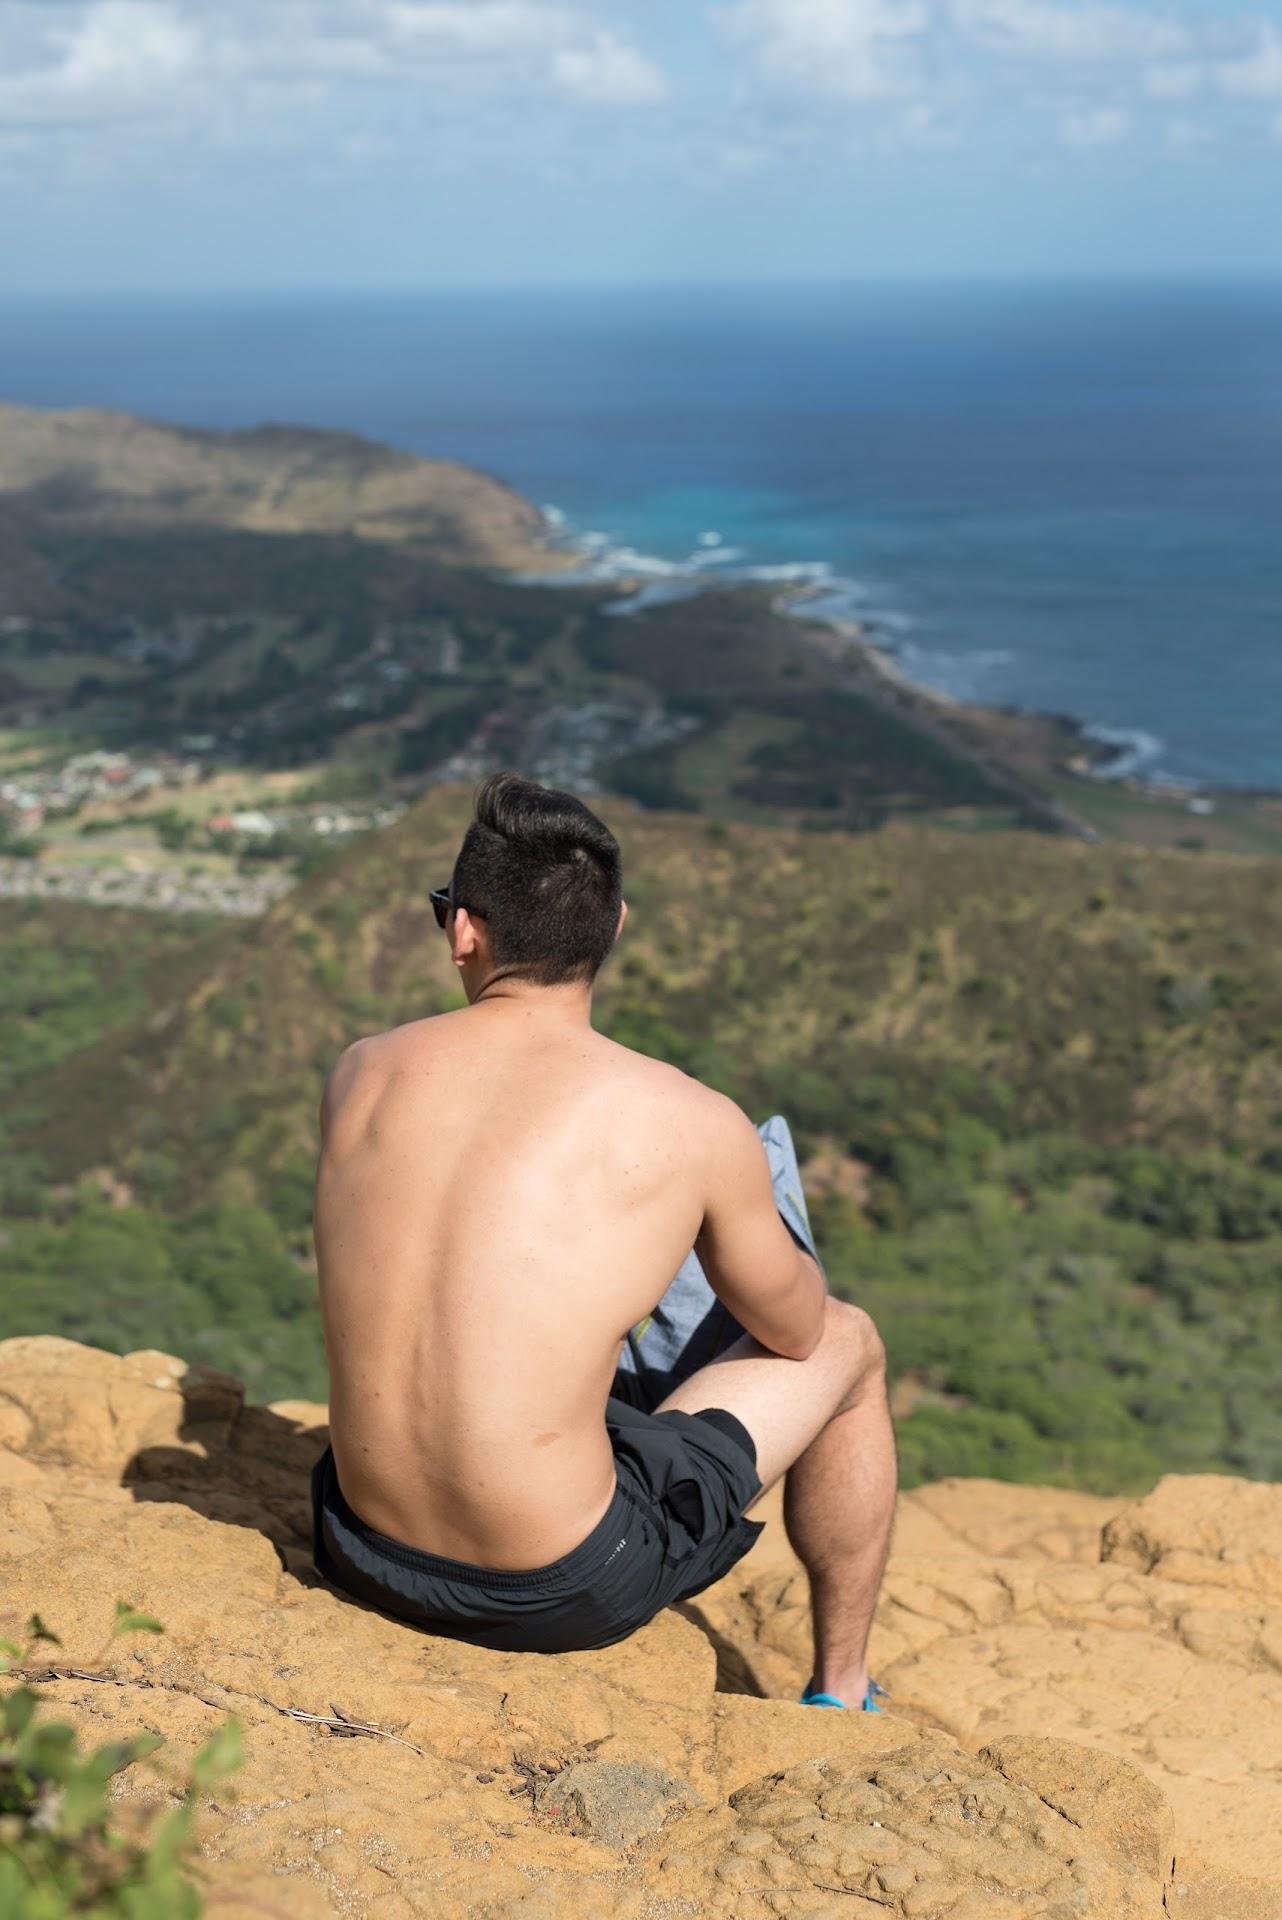 oahu, koko head trail, railway trail, oahu hiking, workout, island, travel blogger, hawaii travel tips, things to do, asian blogger, travel couple, fit couple